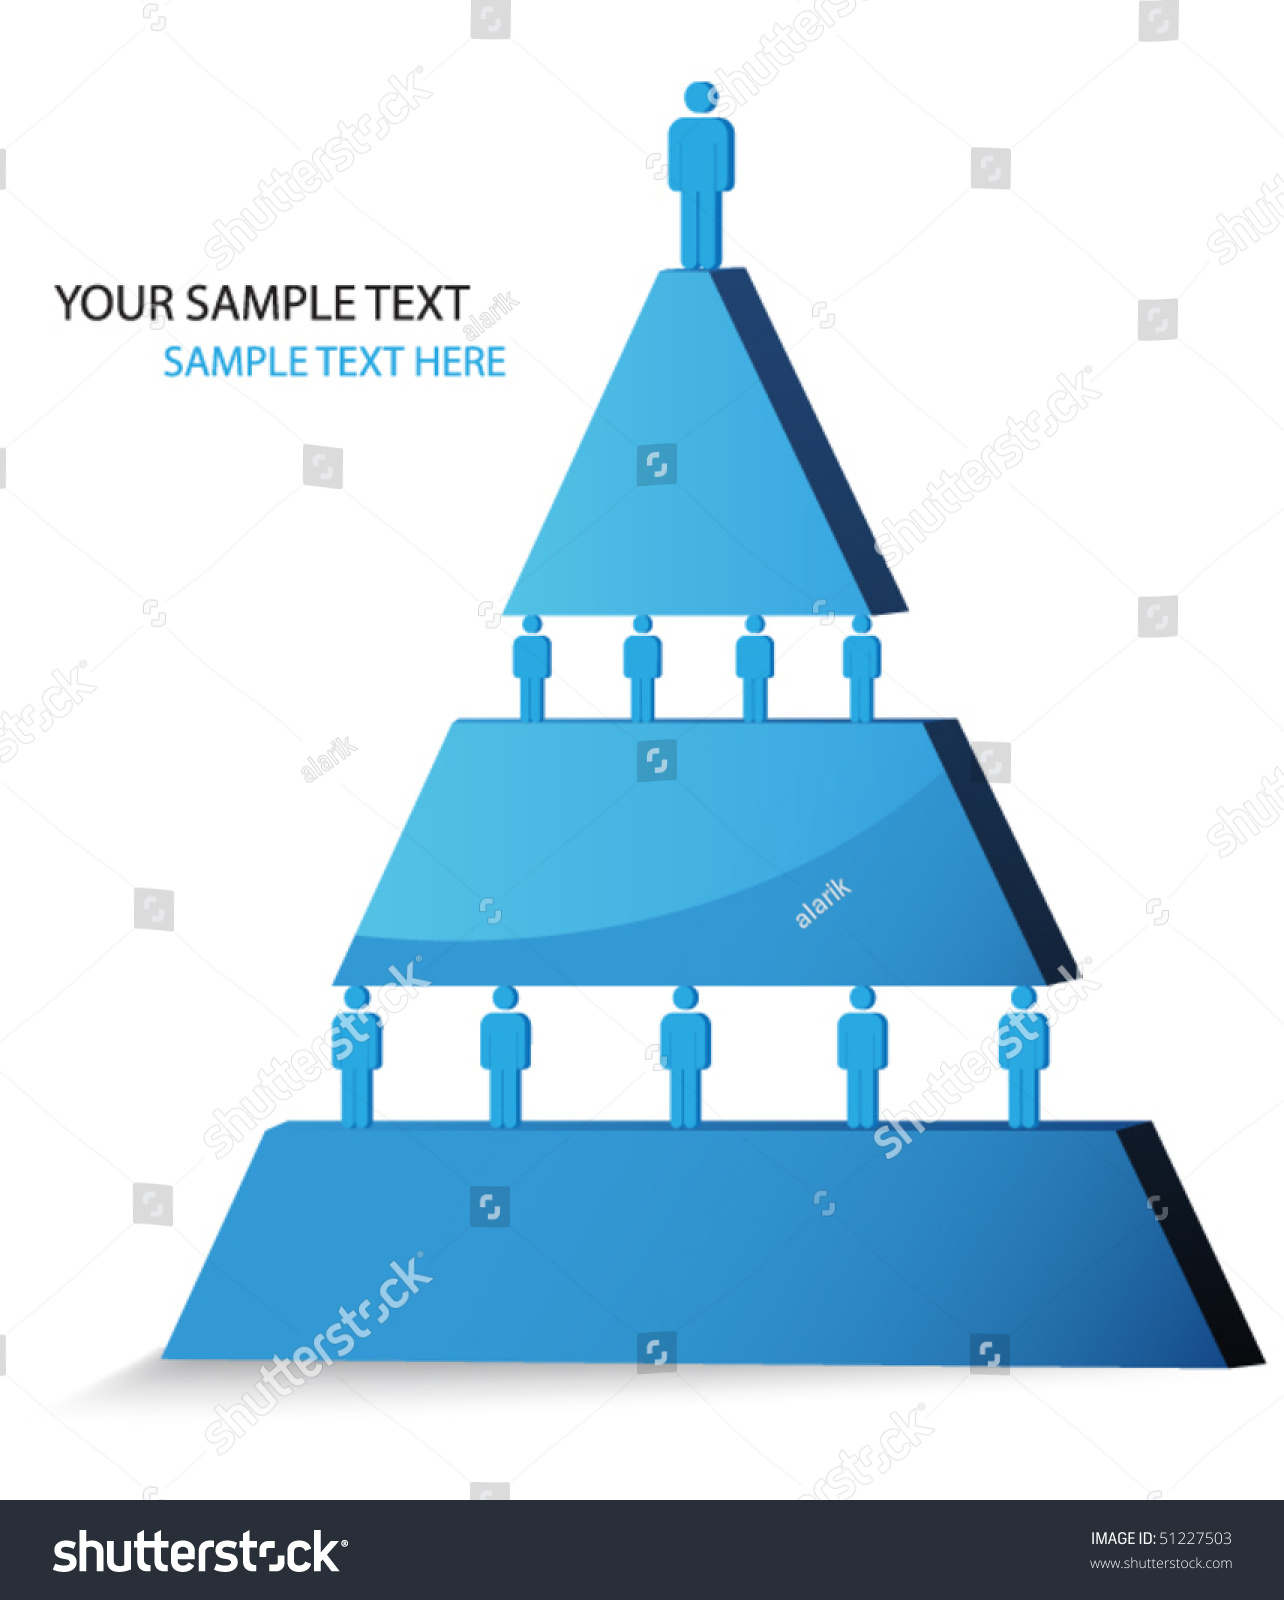 Pyramidal Diagram Illustration Hierarchy Stock Photo (Photo, Vector ...